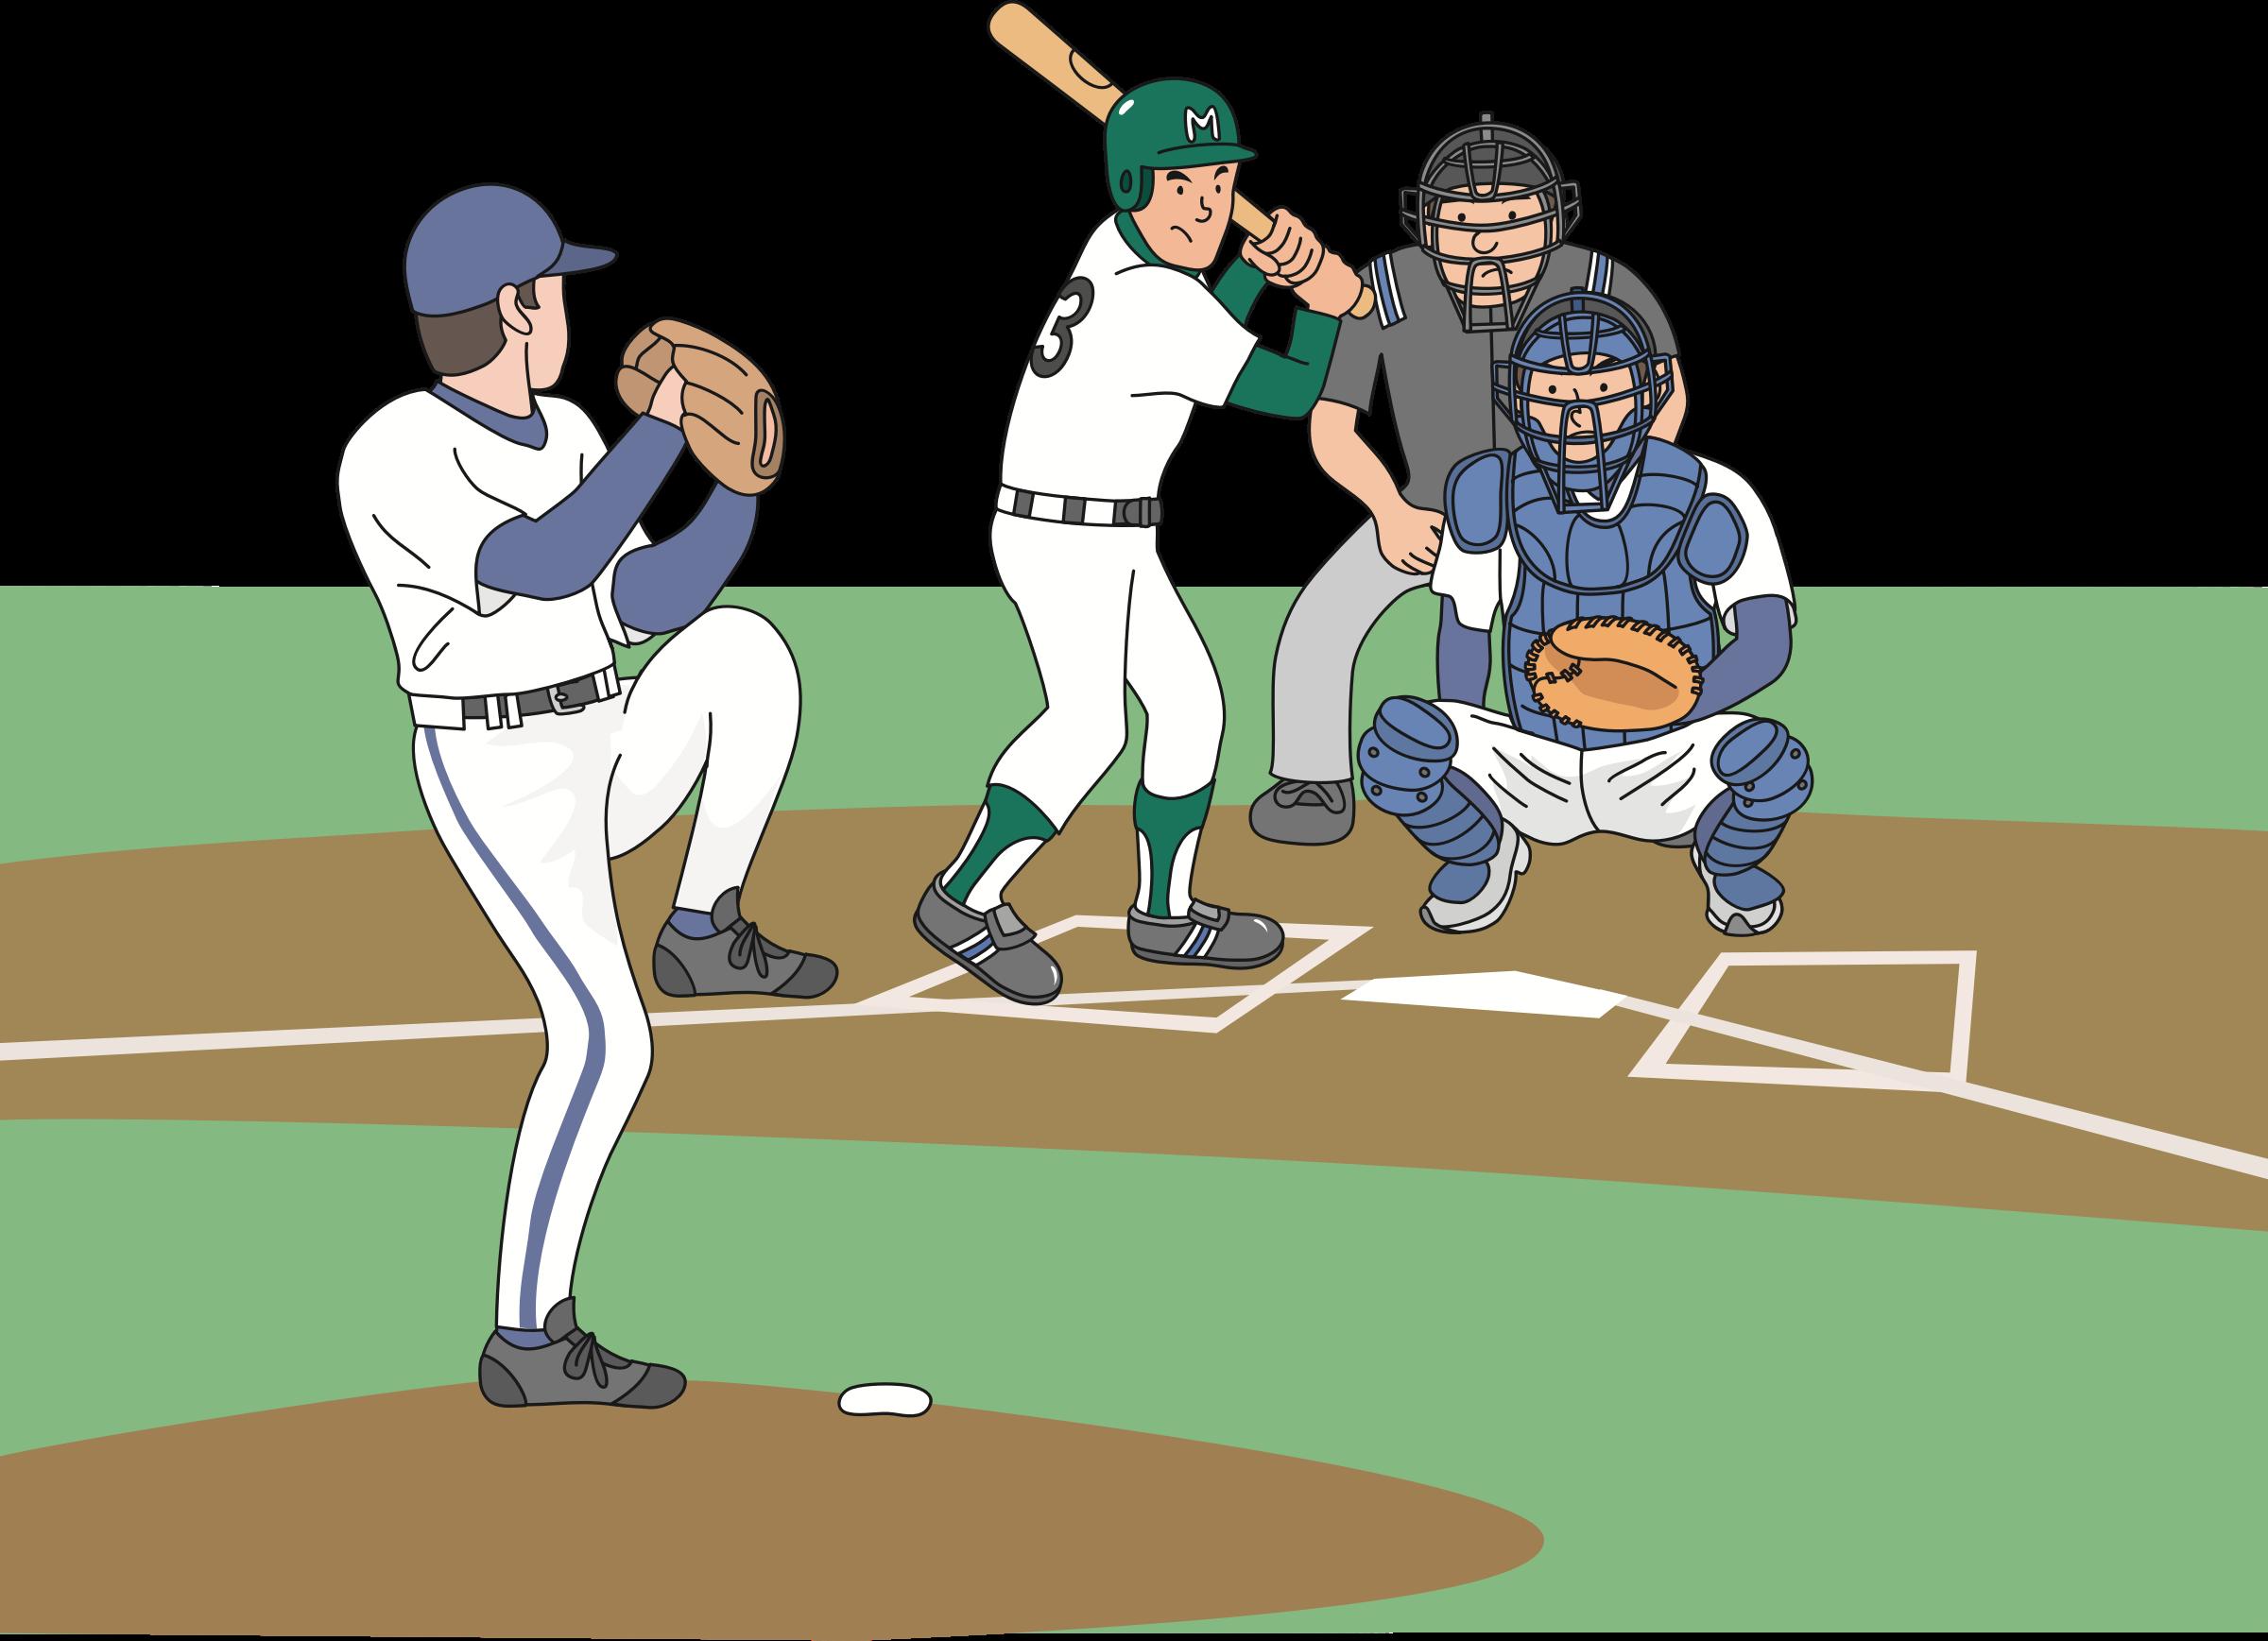 HD Baseball Game Clipart Baseball Game Clipart Baseball.